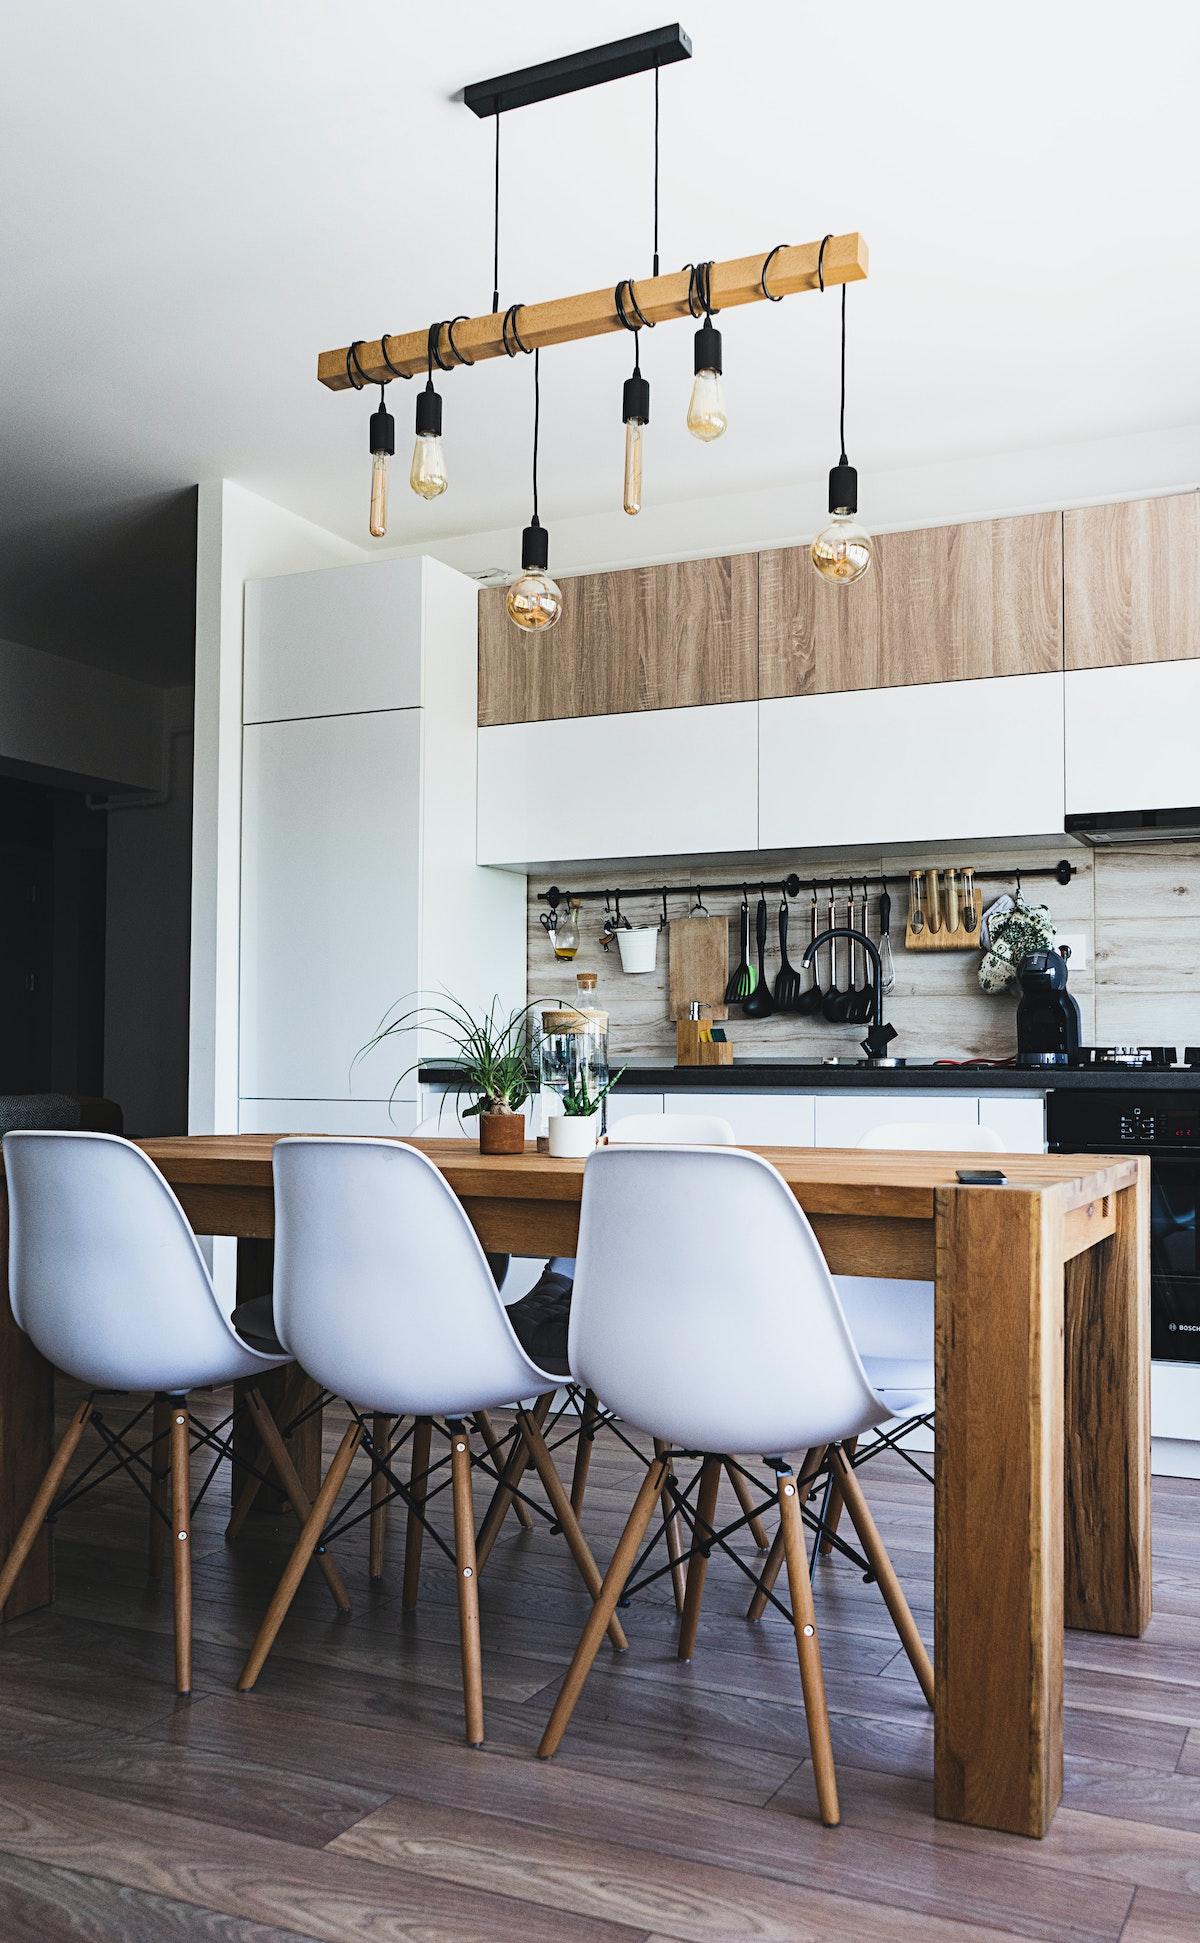 relooker une cuisine loft scandinave sticker imitation bois facade meuble autocollant adhésif trompe oeil